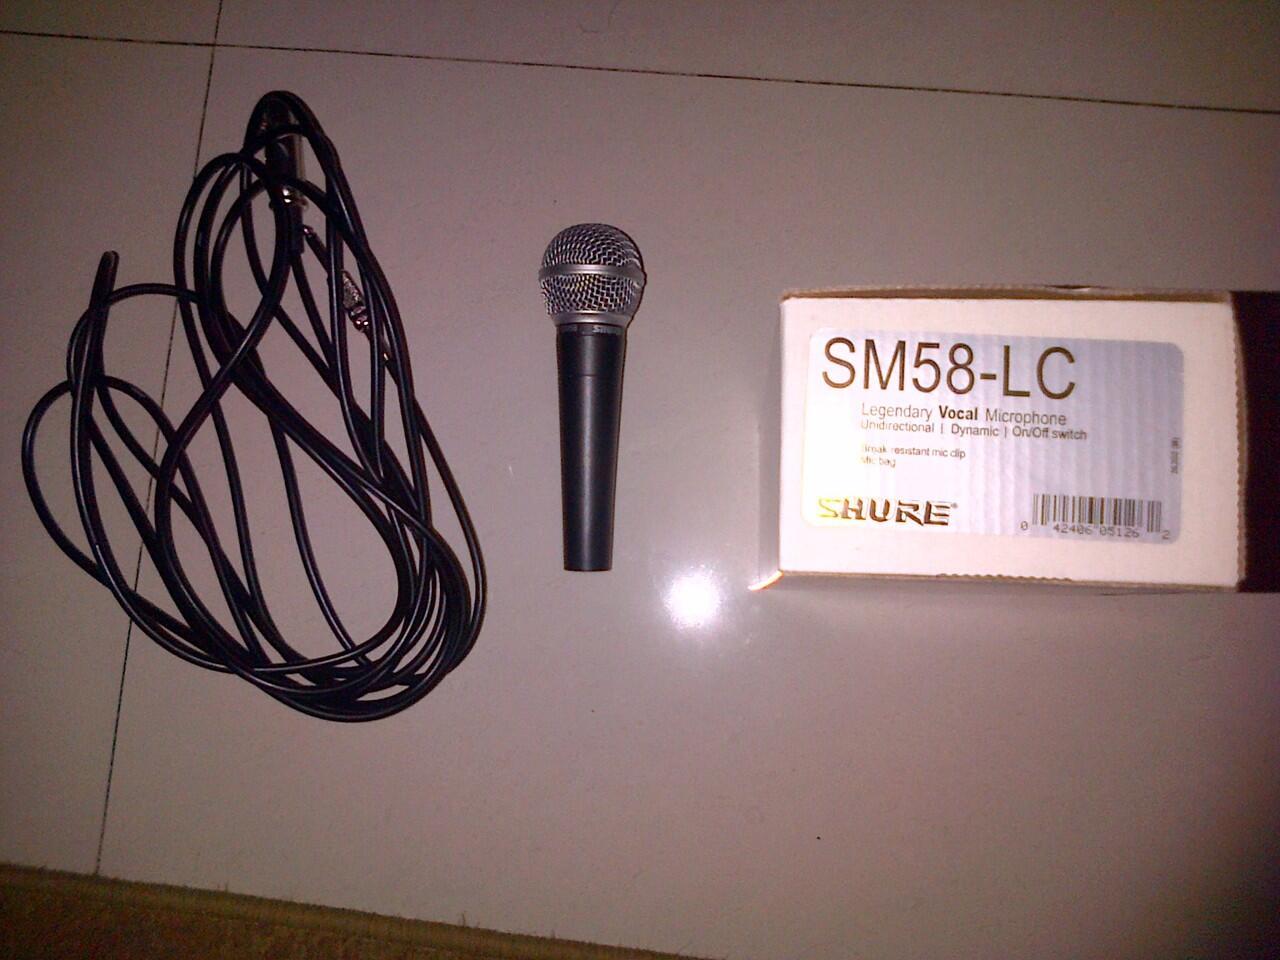 soundcard + mic